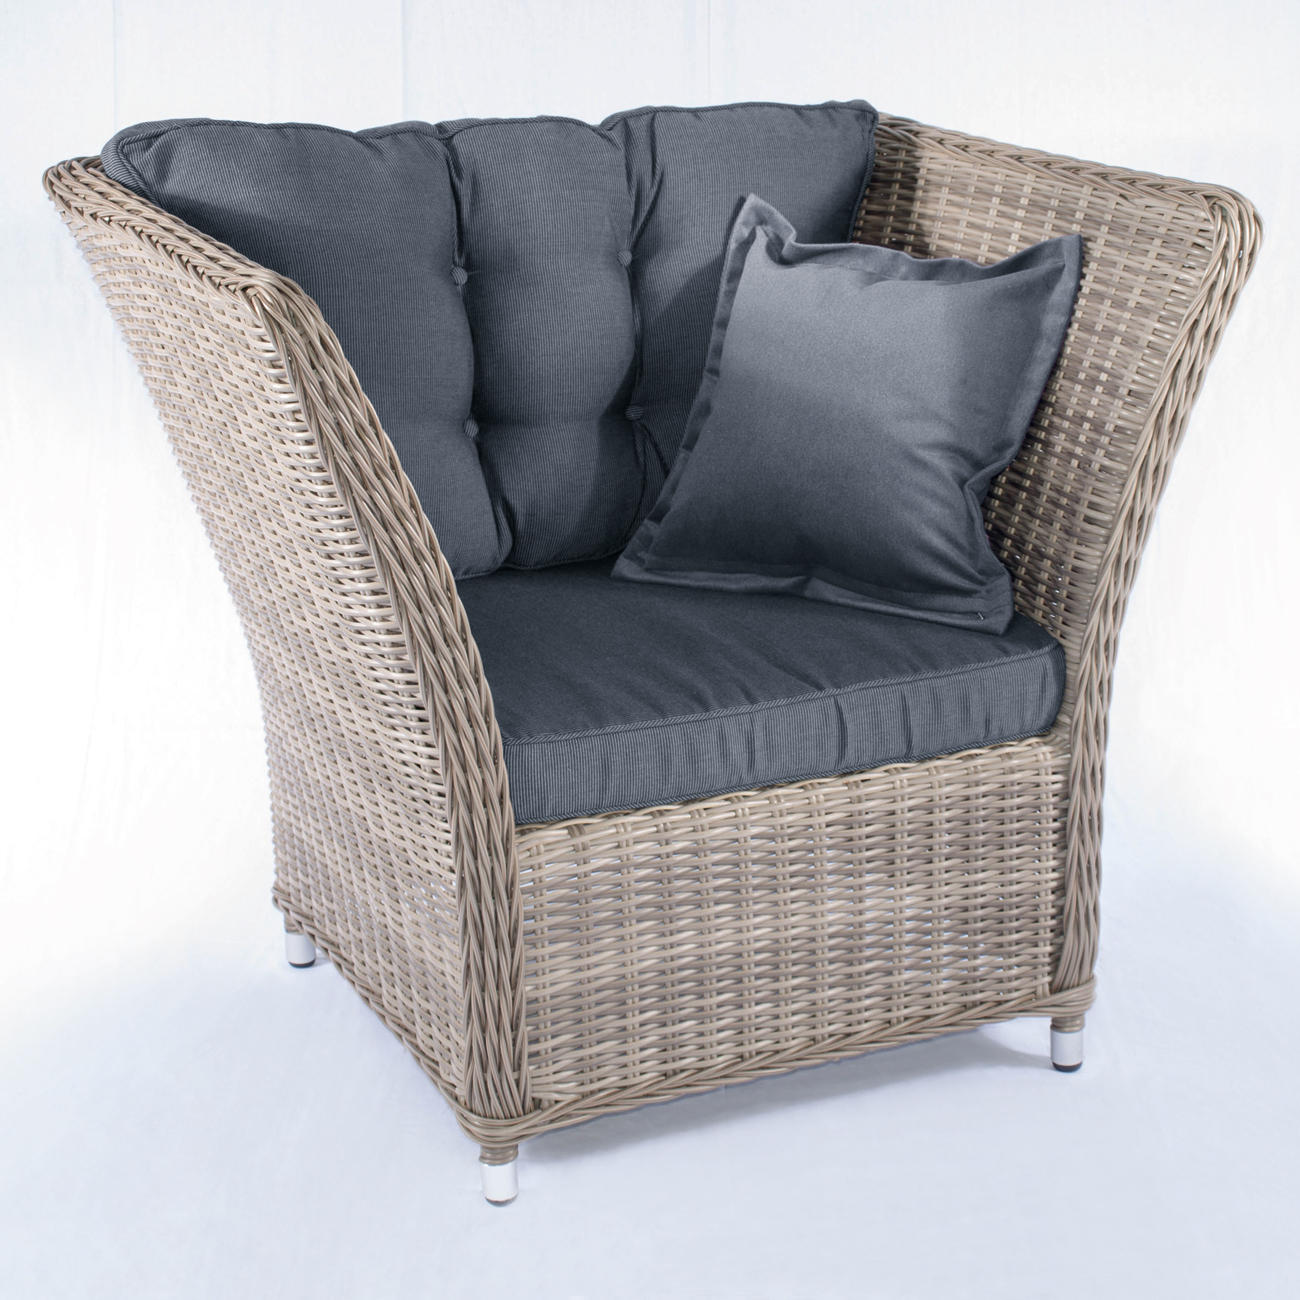 polyrattan lounge m bel 3 jahre garantie pro idee. Black Bedroom Furniture Sets. Home Design Ideas